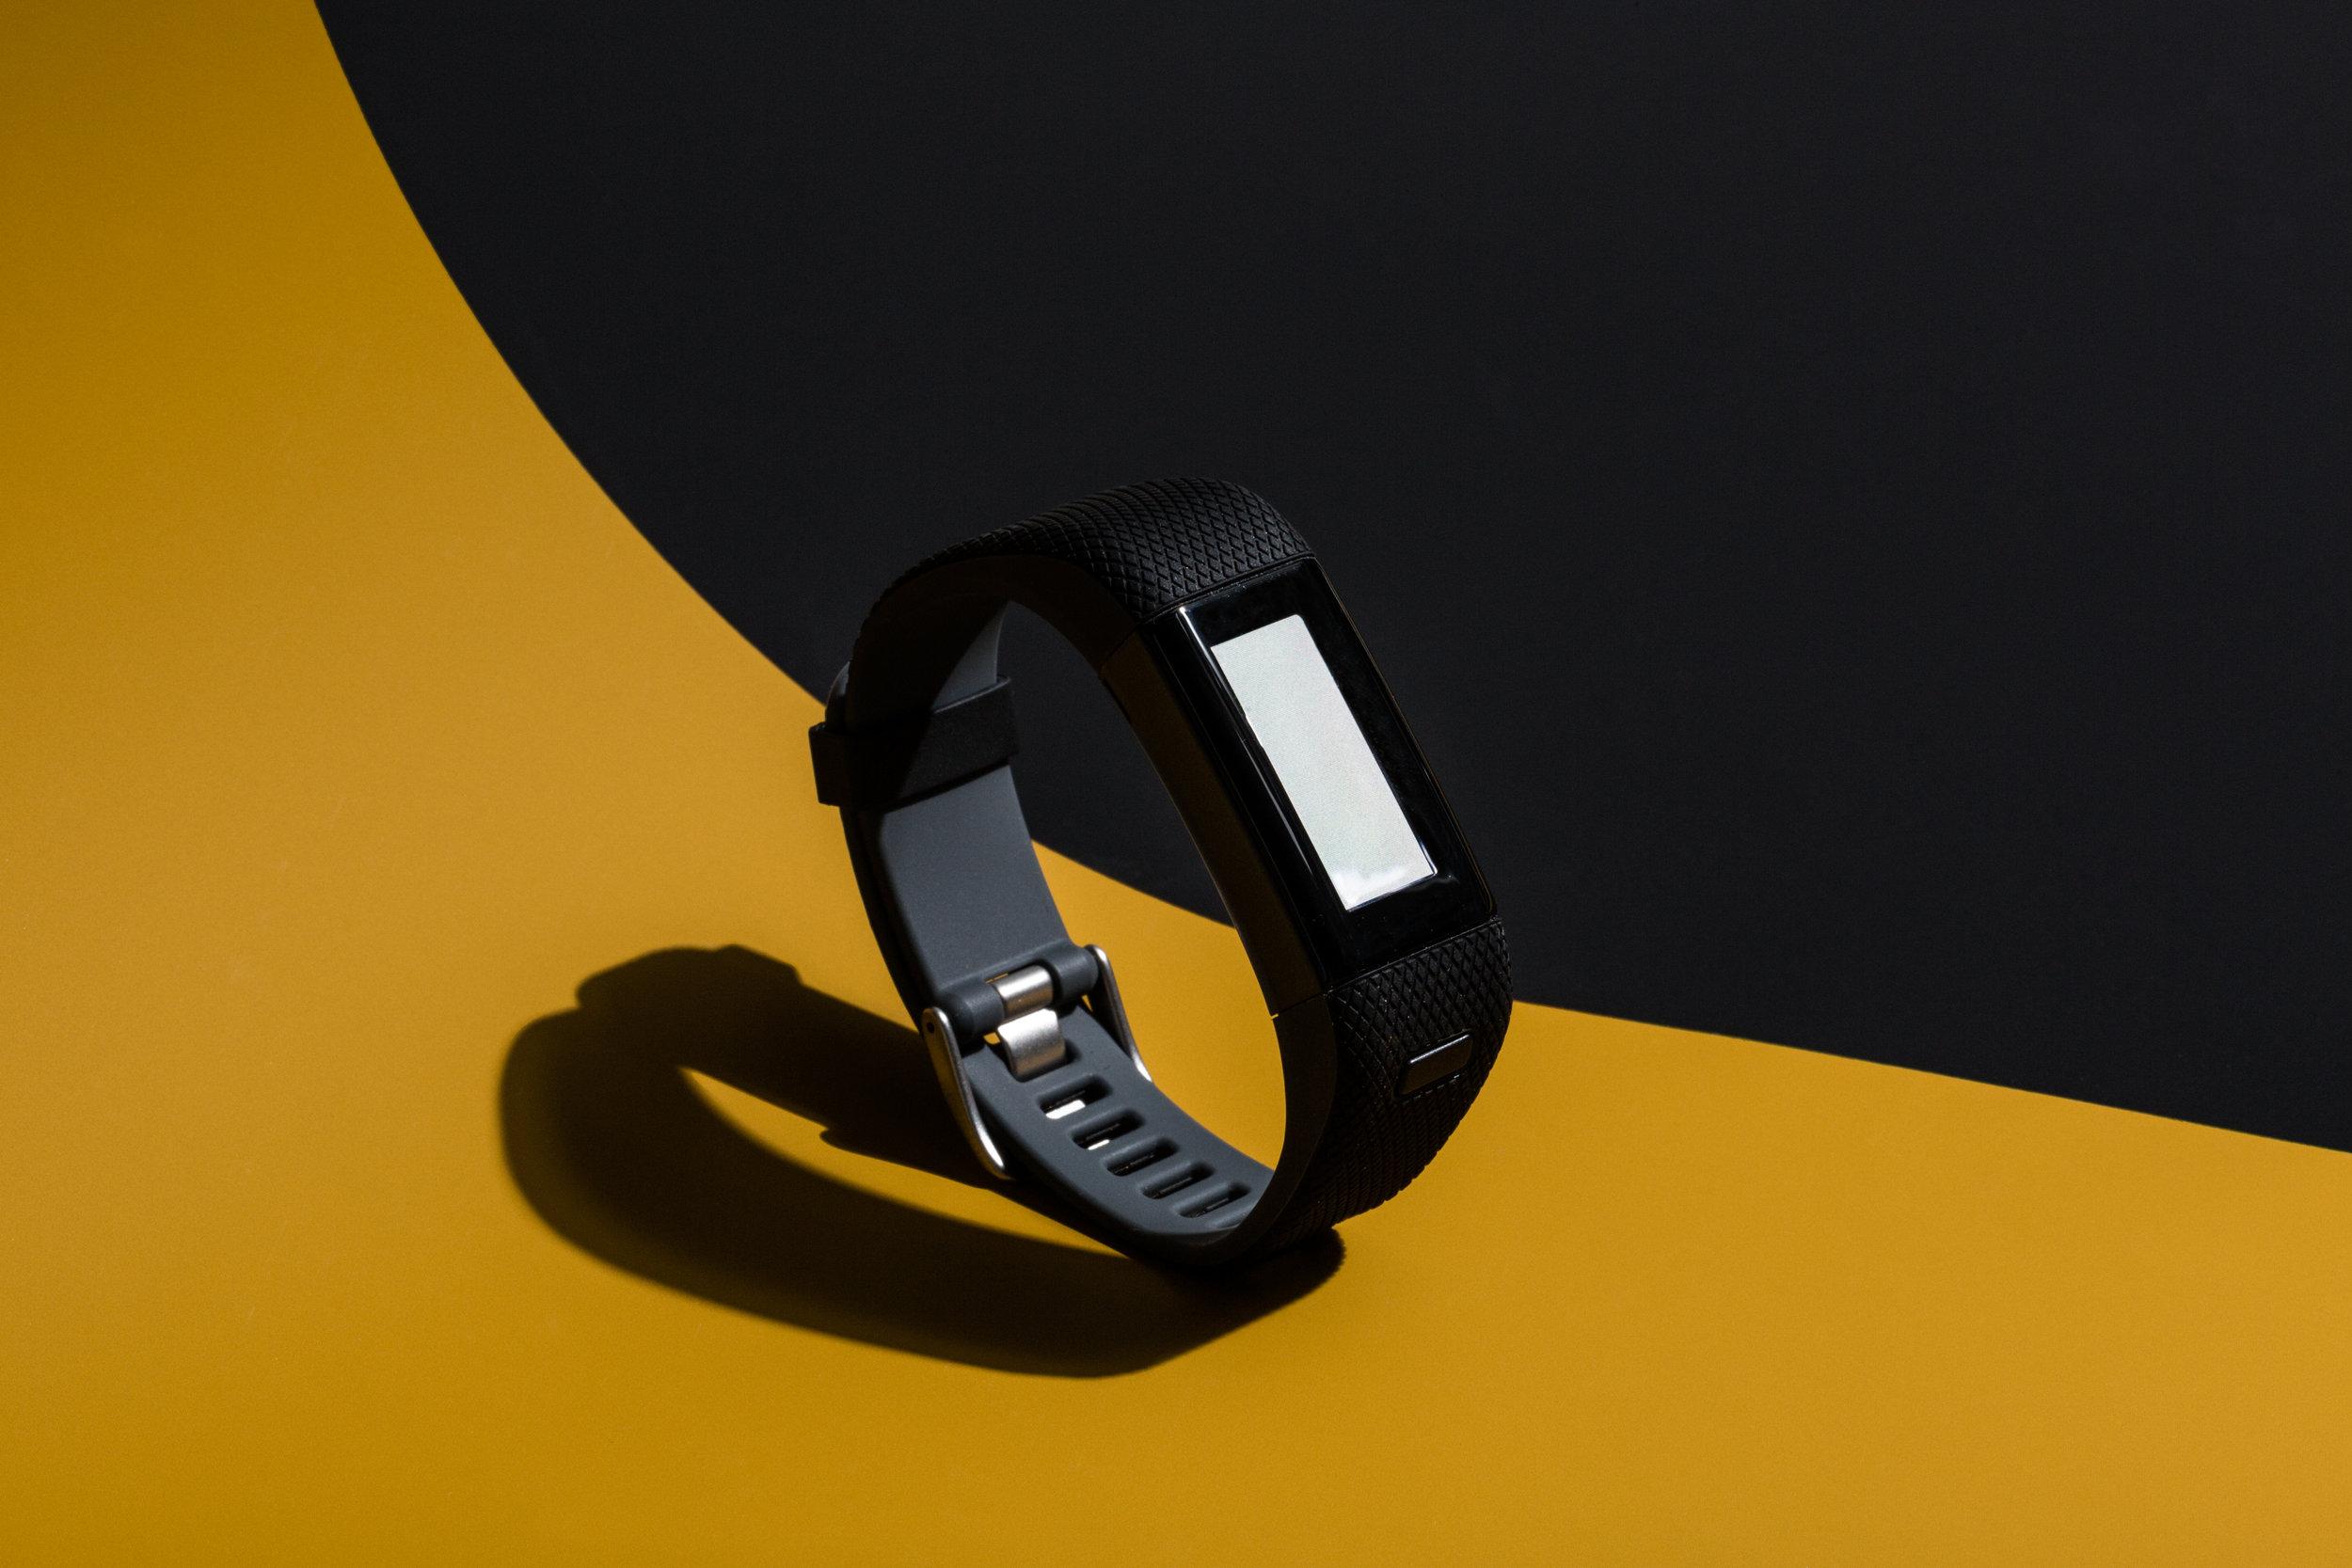 fitness-tracker-best-stuff-02.jpg